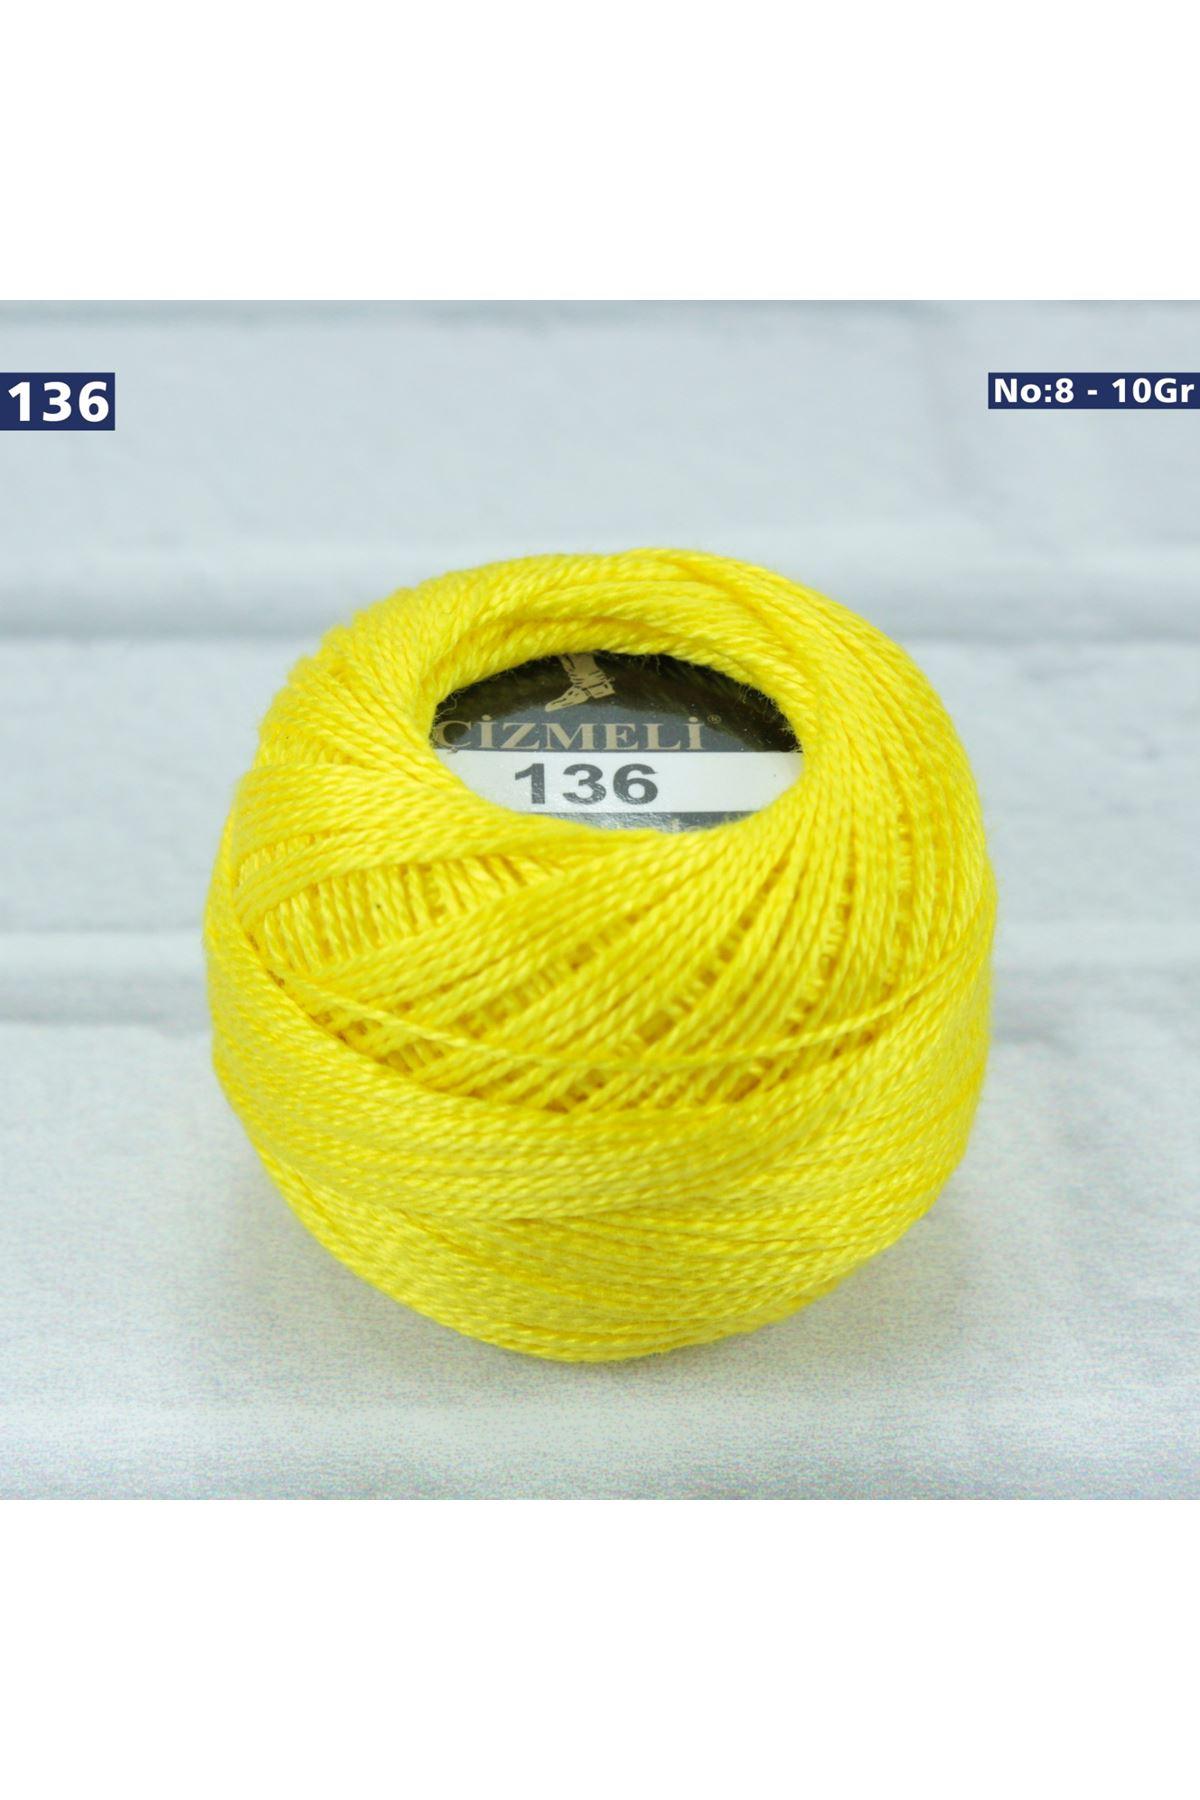 Çizmeli Cotton Perle Nakış İpliği No: 136